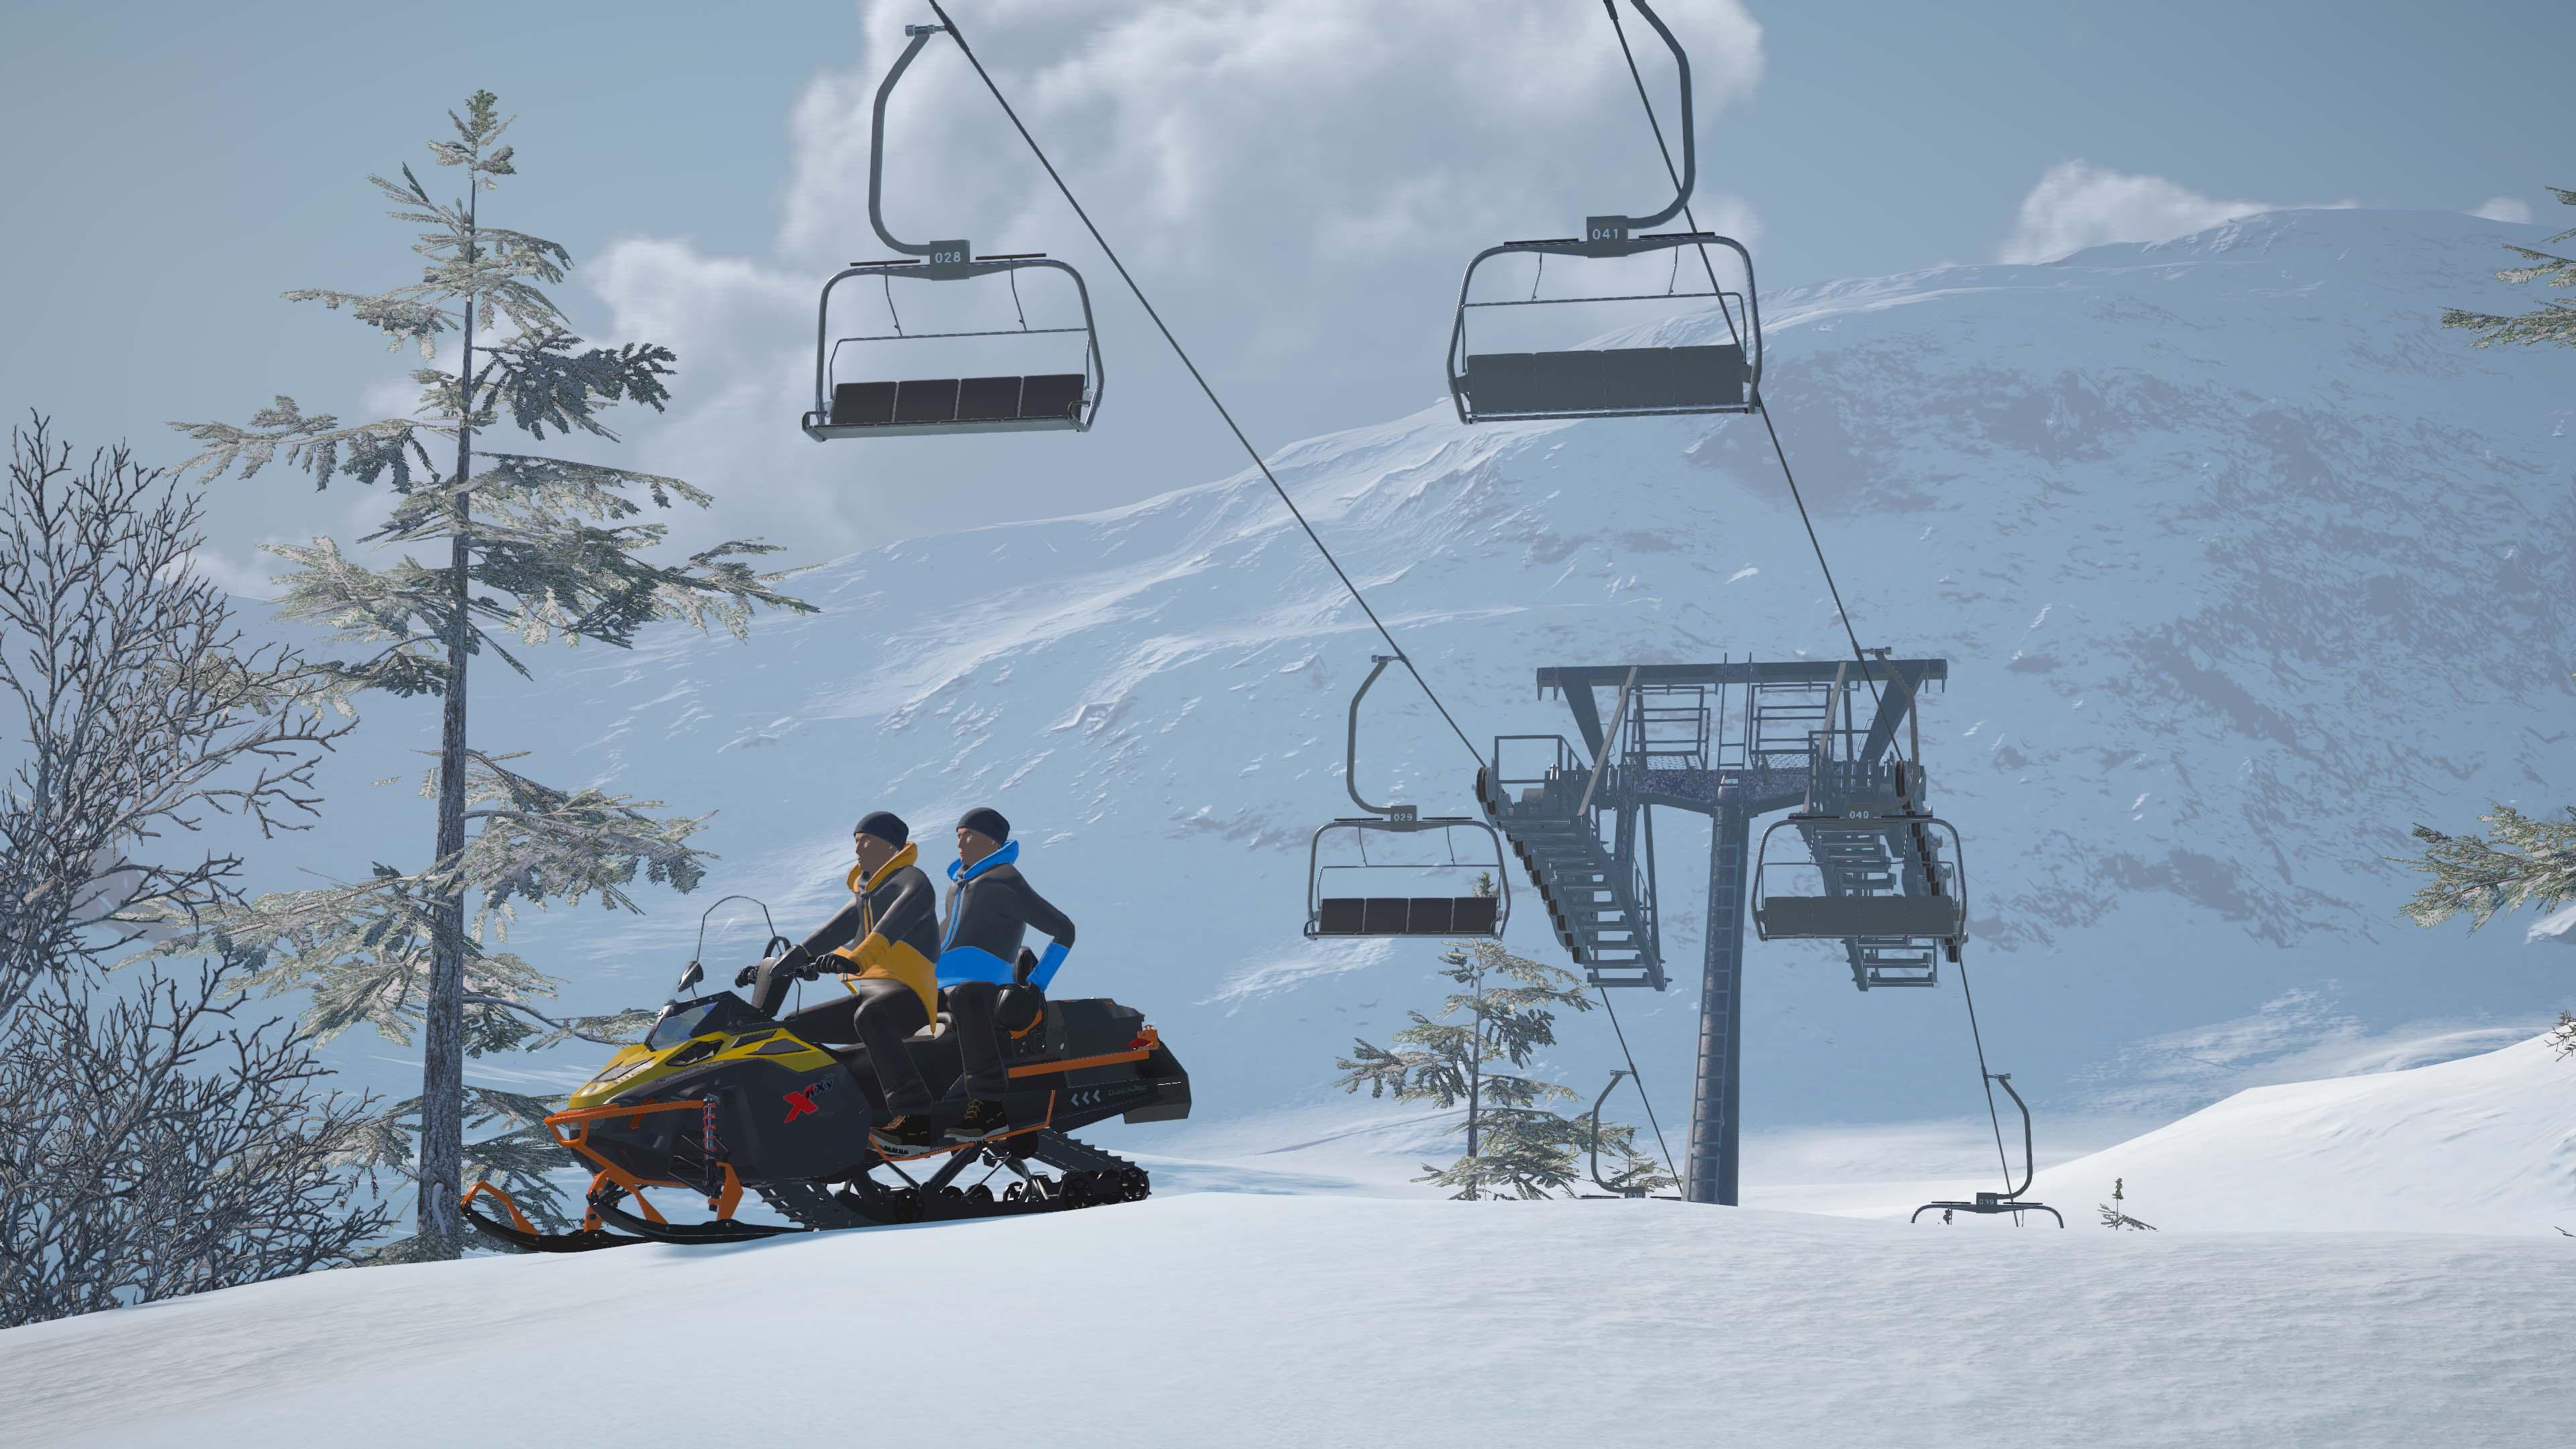 Winter Resort Simulator Season 2 - Complete Edition